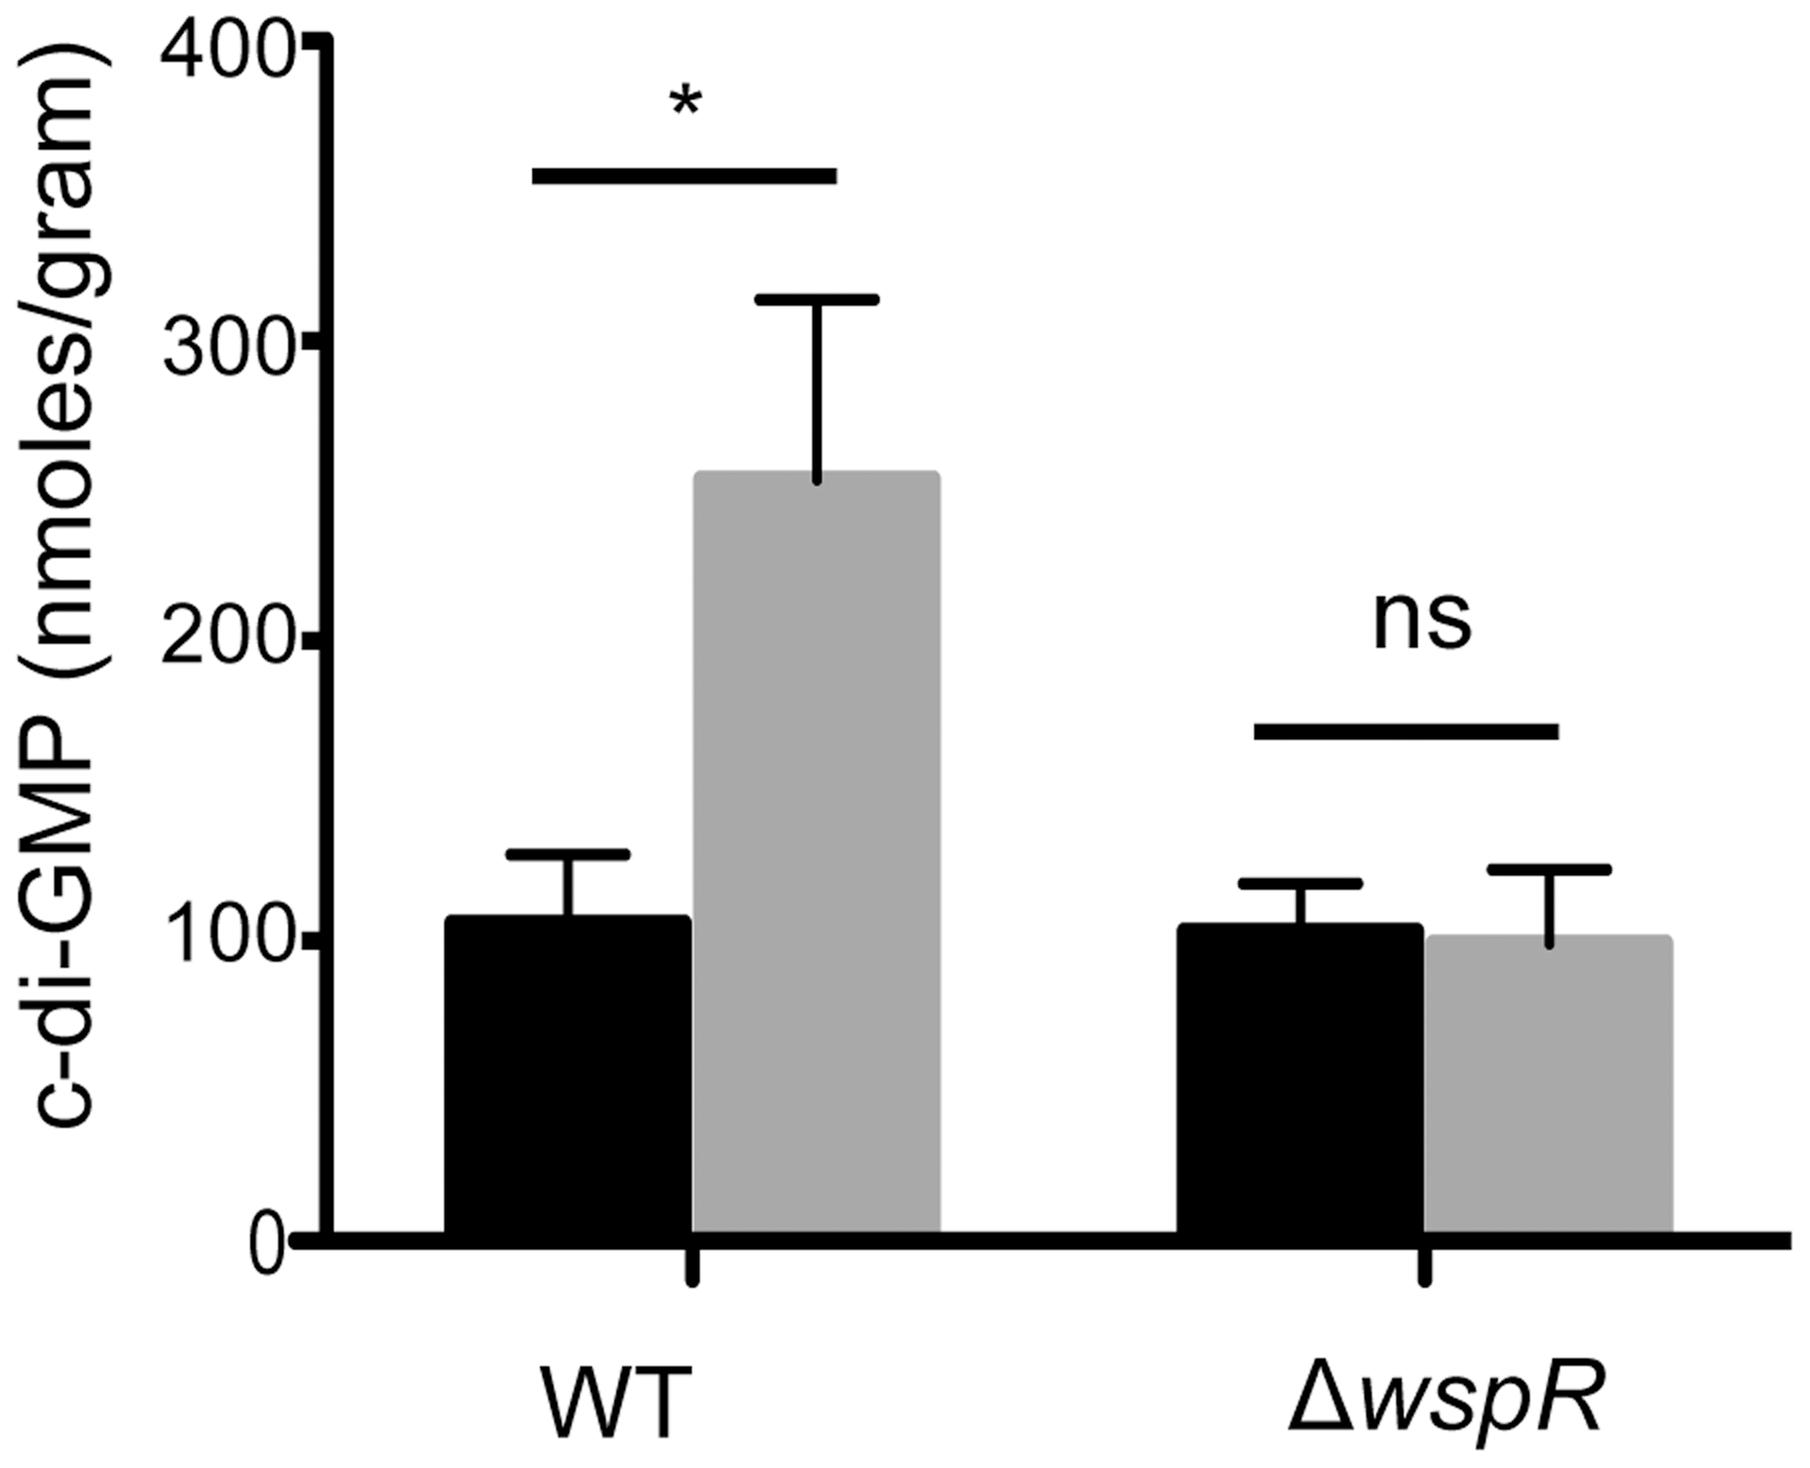 Ethanol increases c-di-GMP levels in <i>P. aeruginosa</i> strain PA14 WT but not in a Δ<i>wspR</i> mutant.